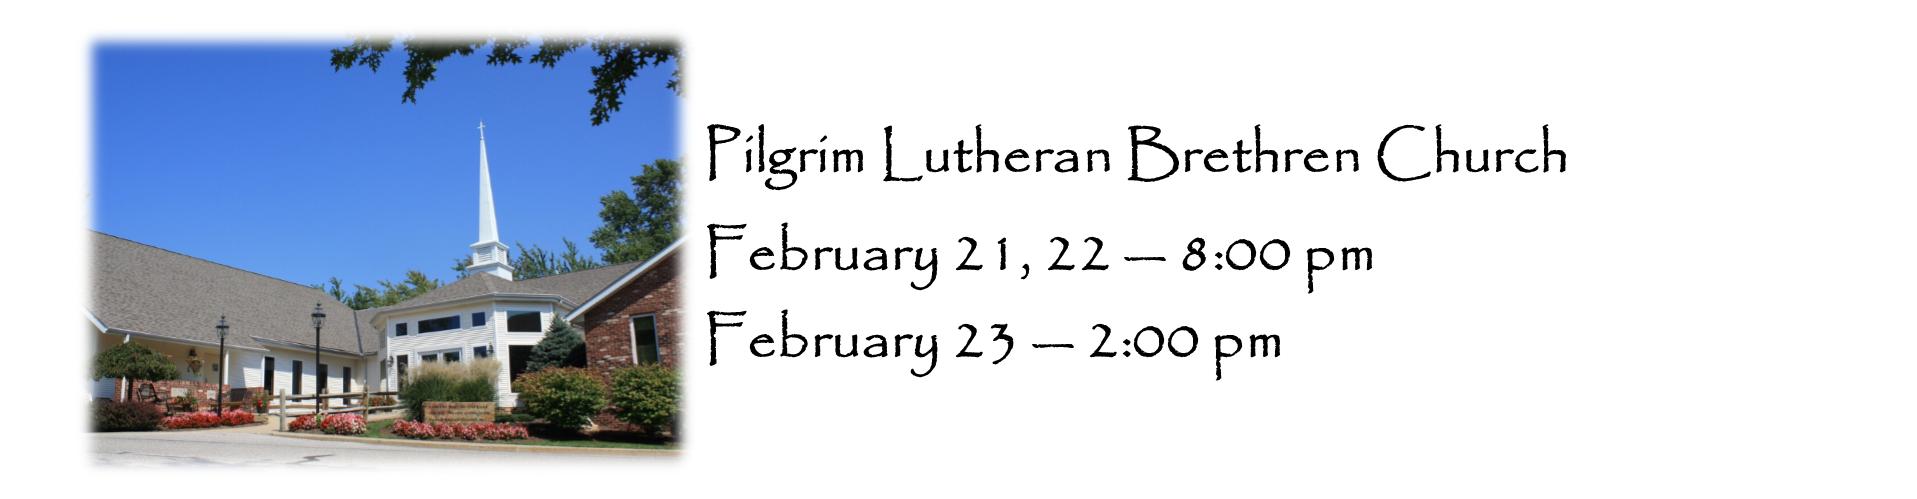 Pilgrim Lutheran Brethren Church